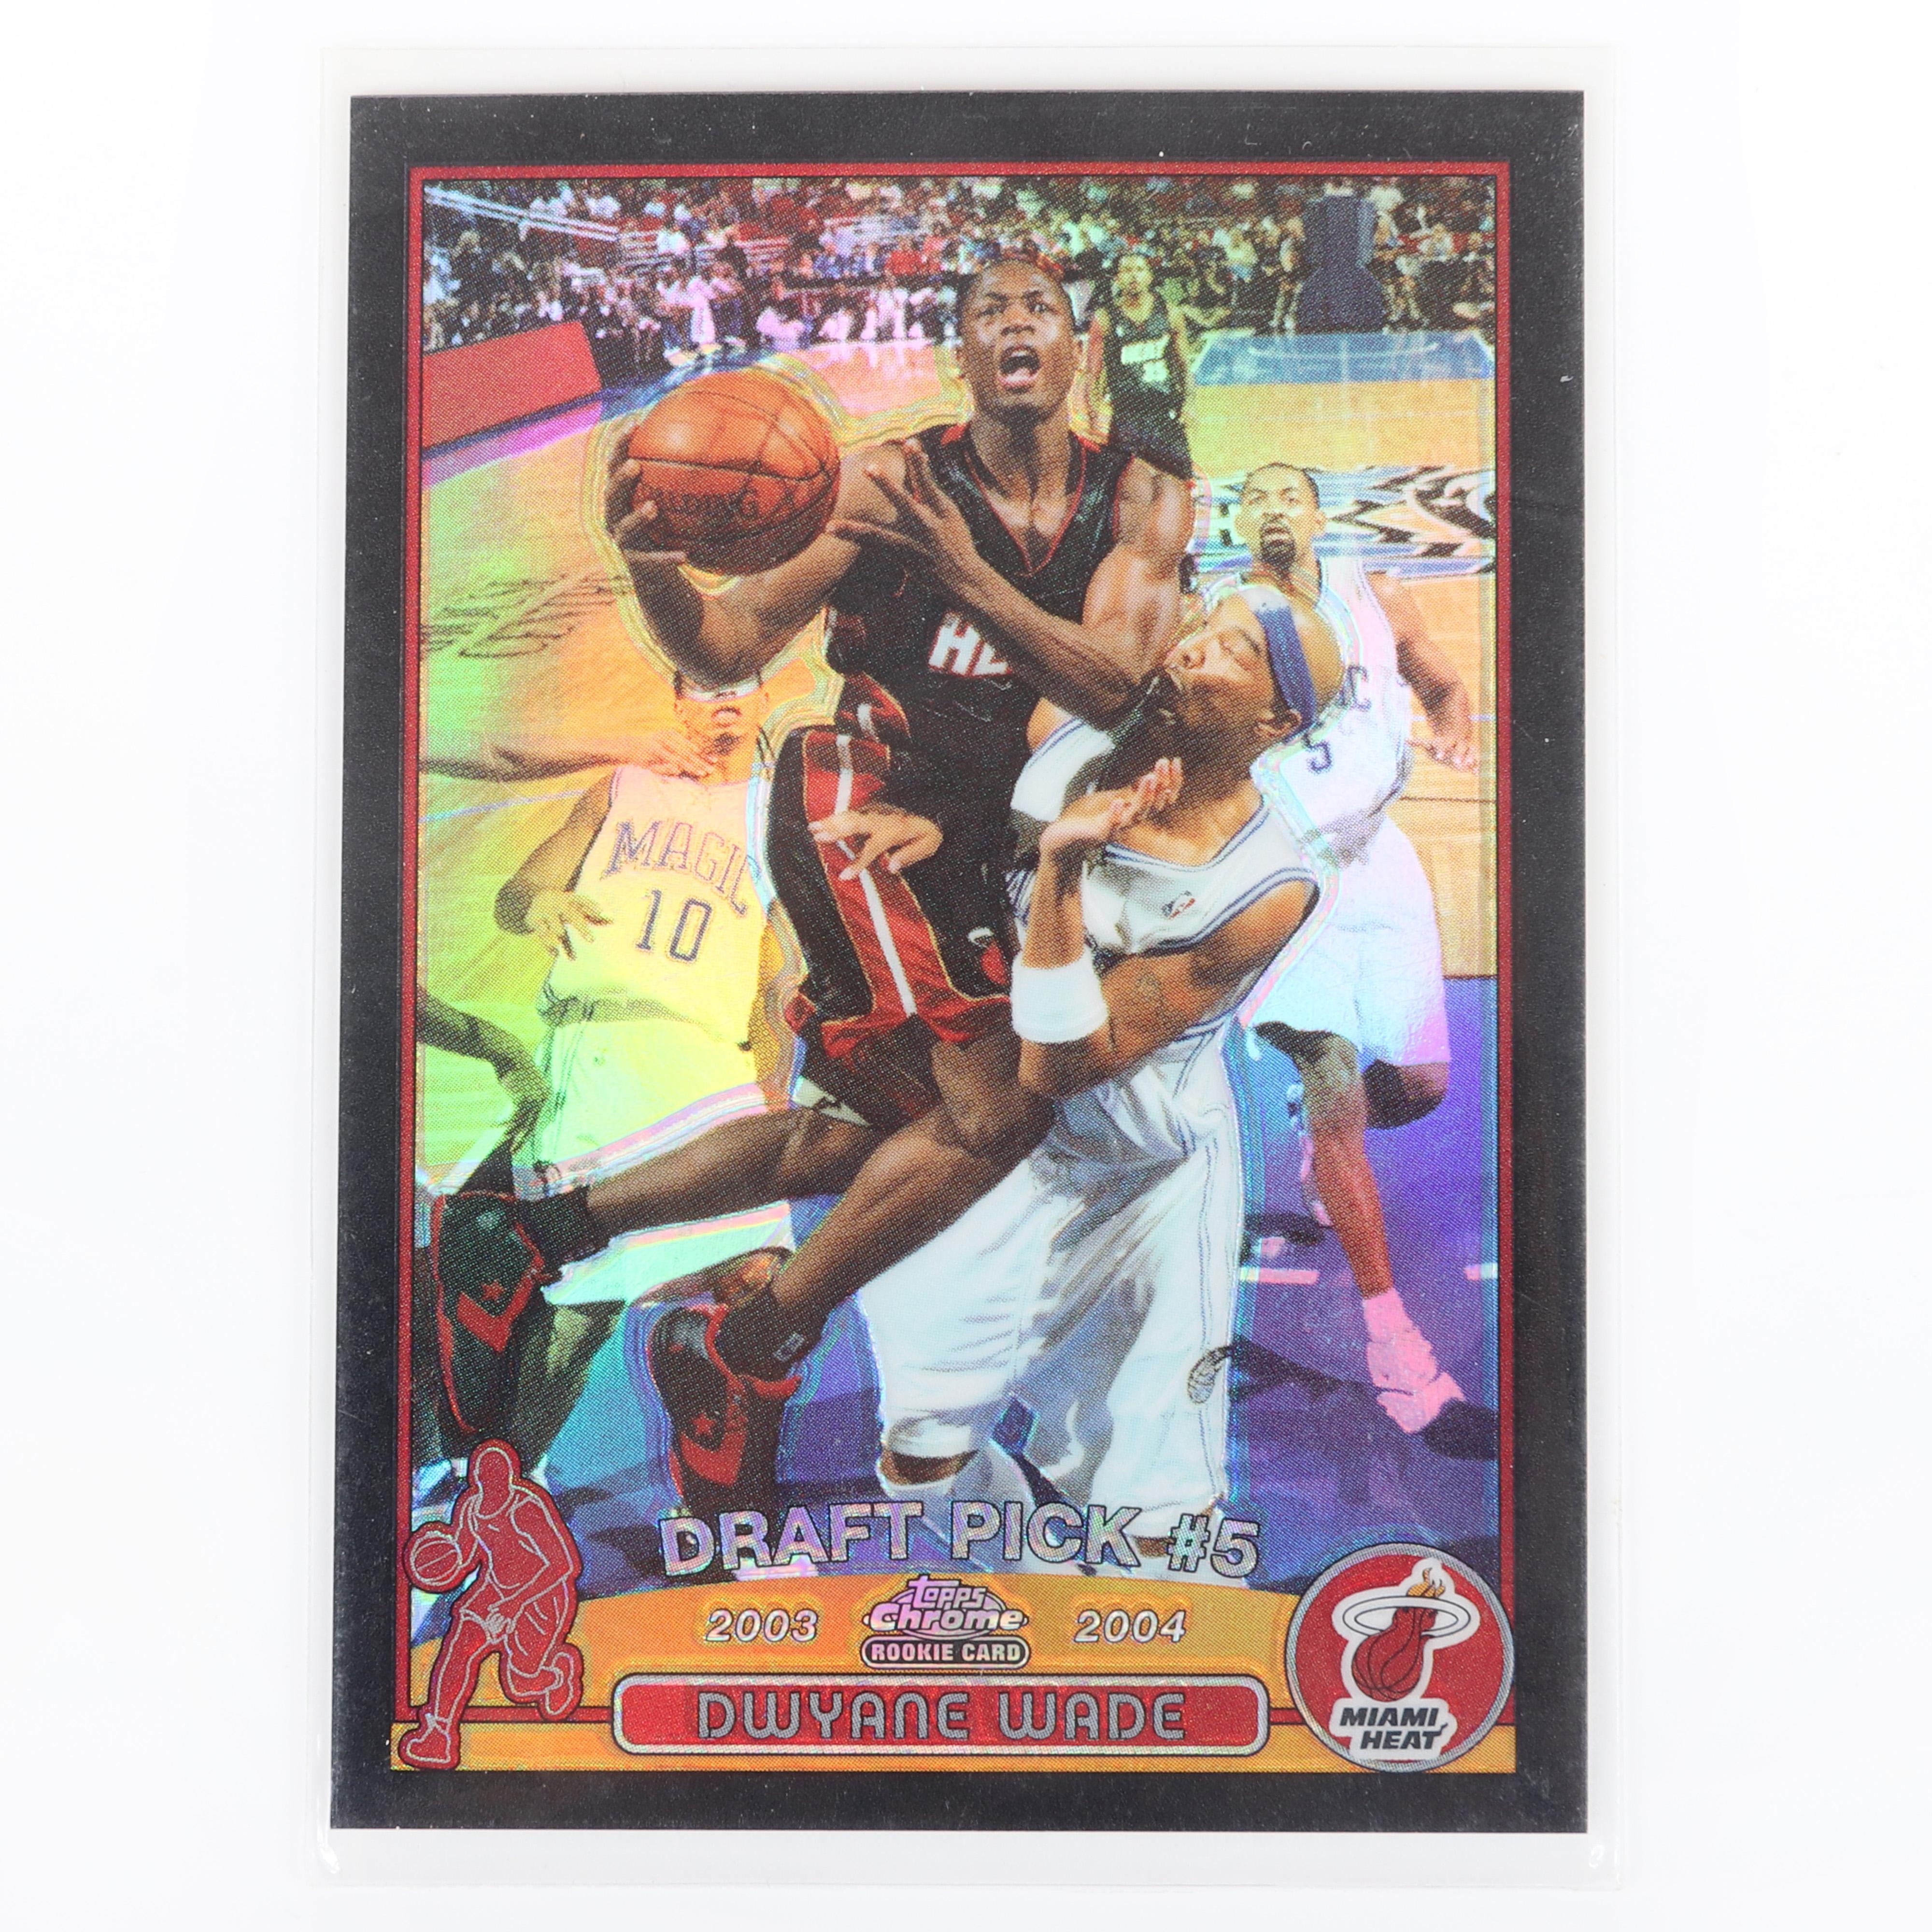 2003-04 Topps Chrome Dwyane Wade Rookie Black Refractor #115, 300/500